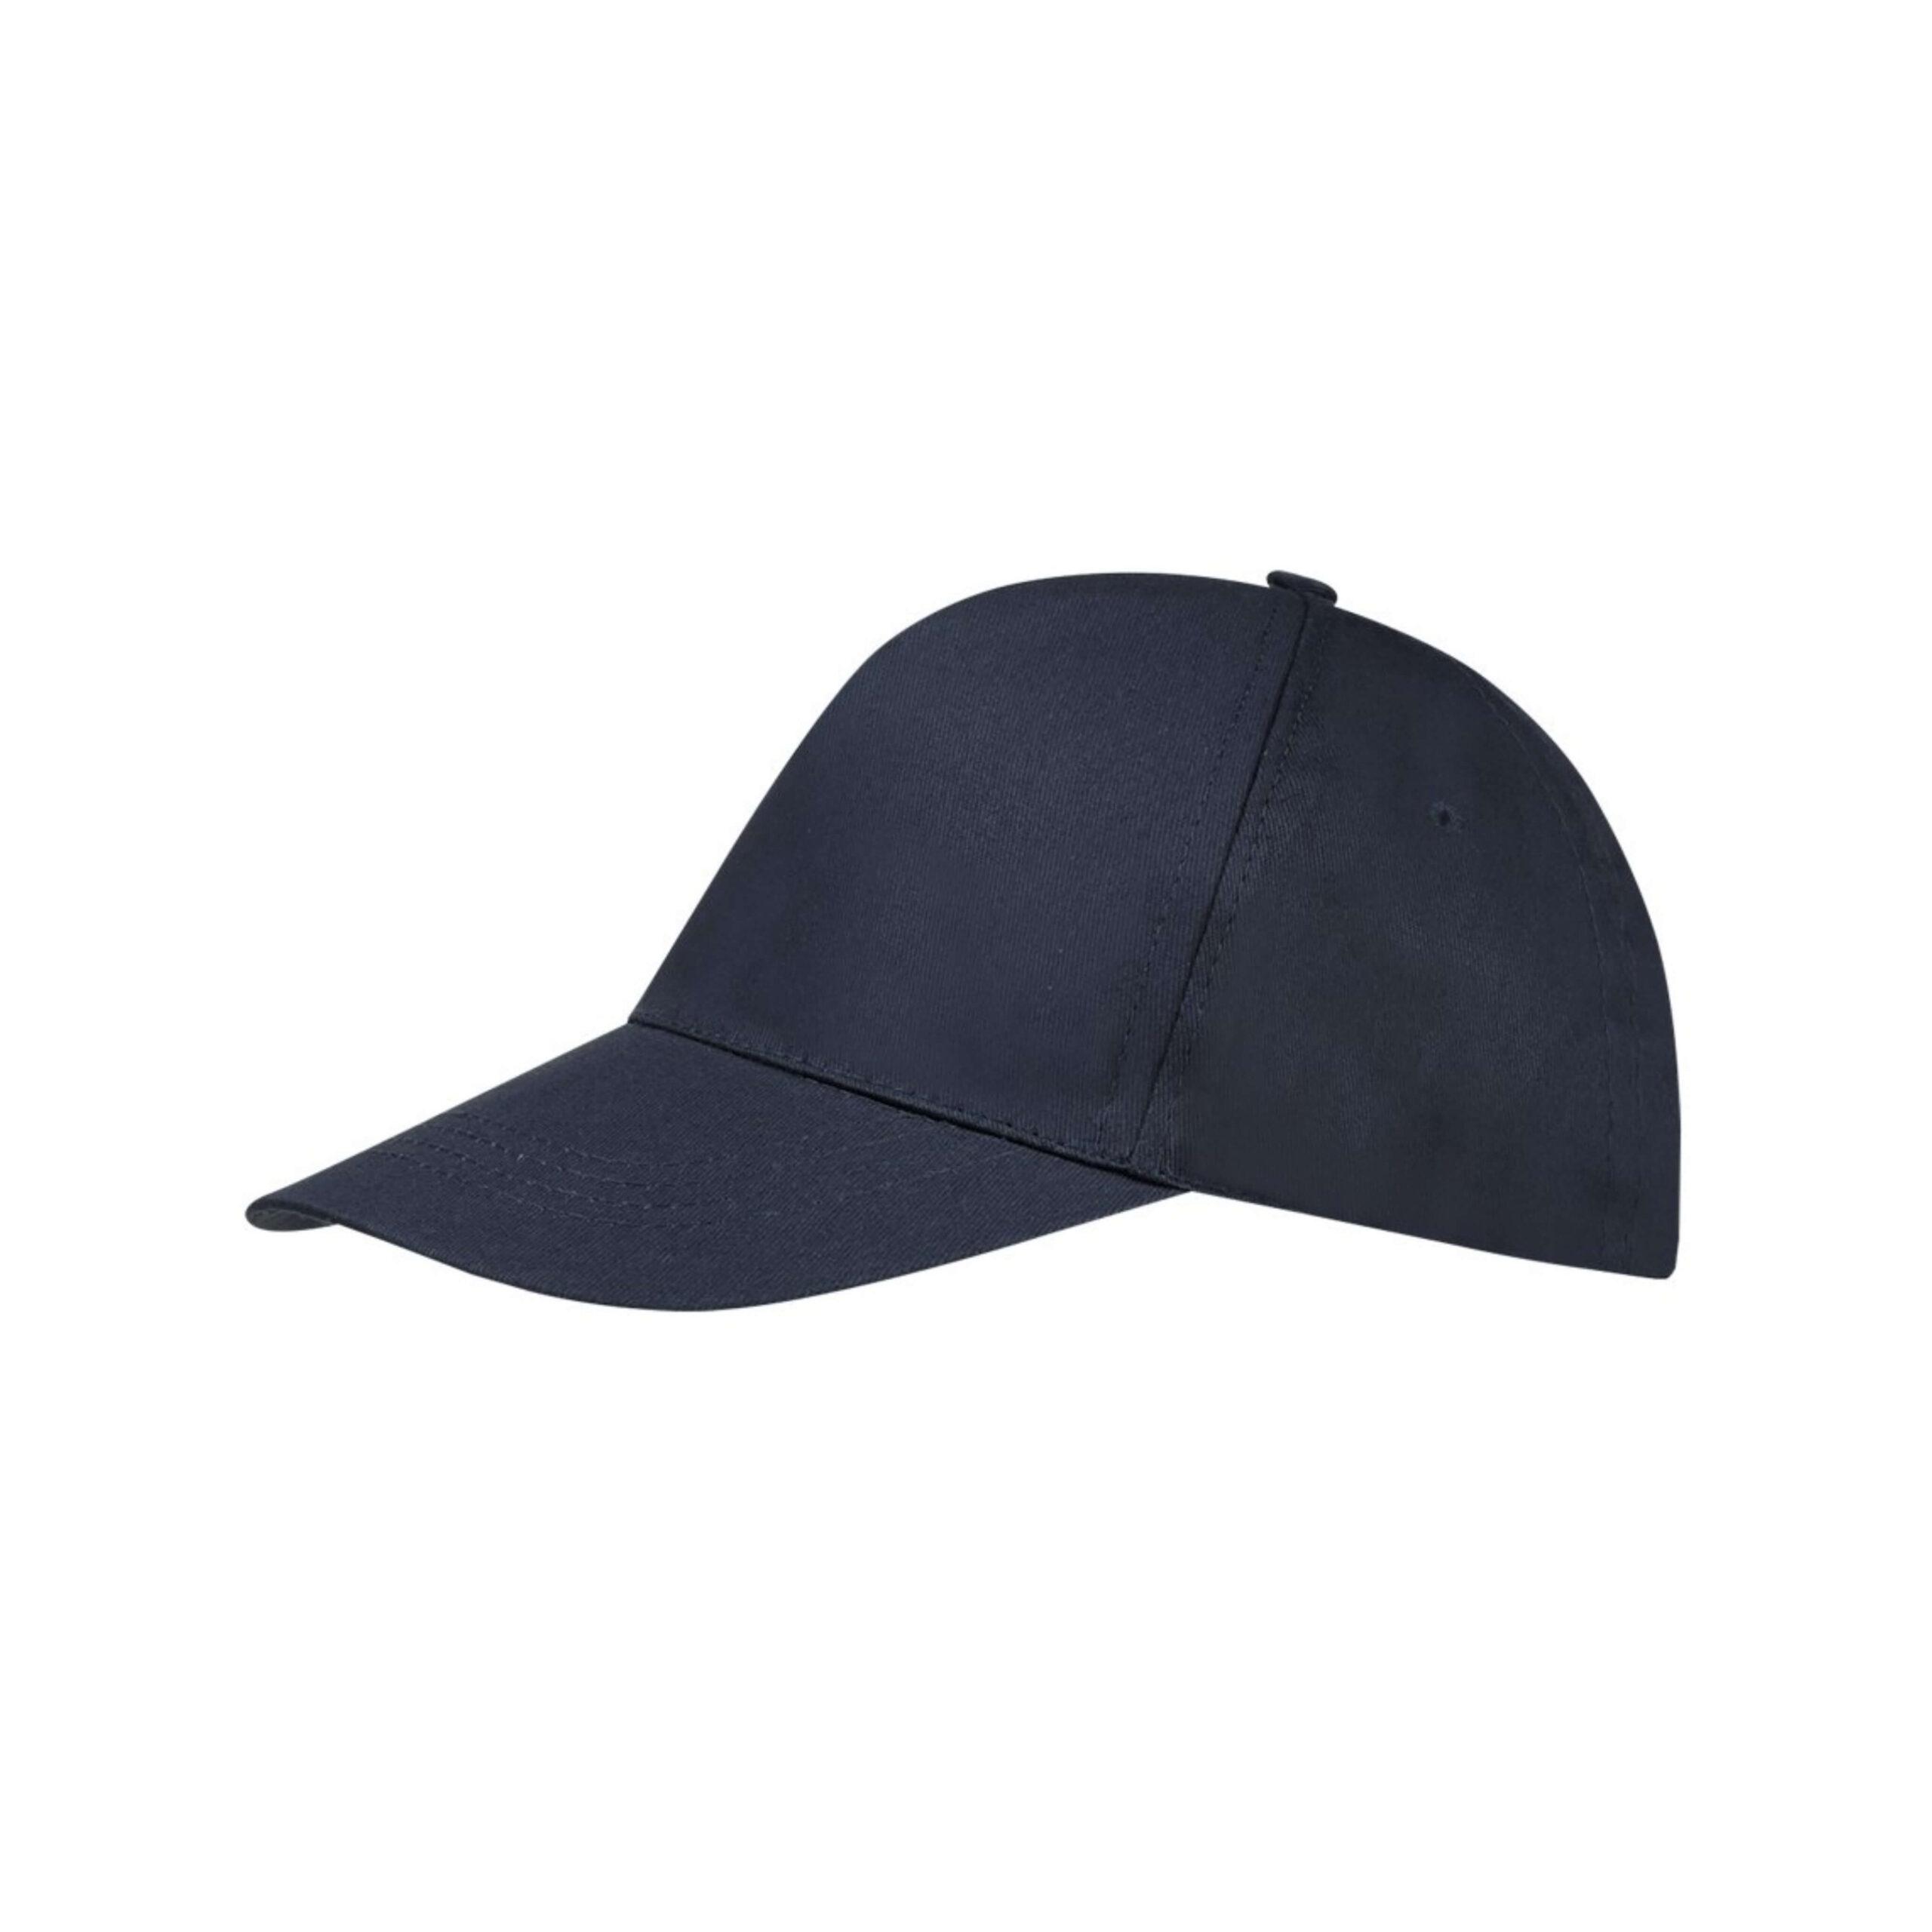 hat-twill-cotton-88119-2